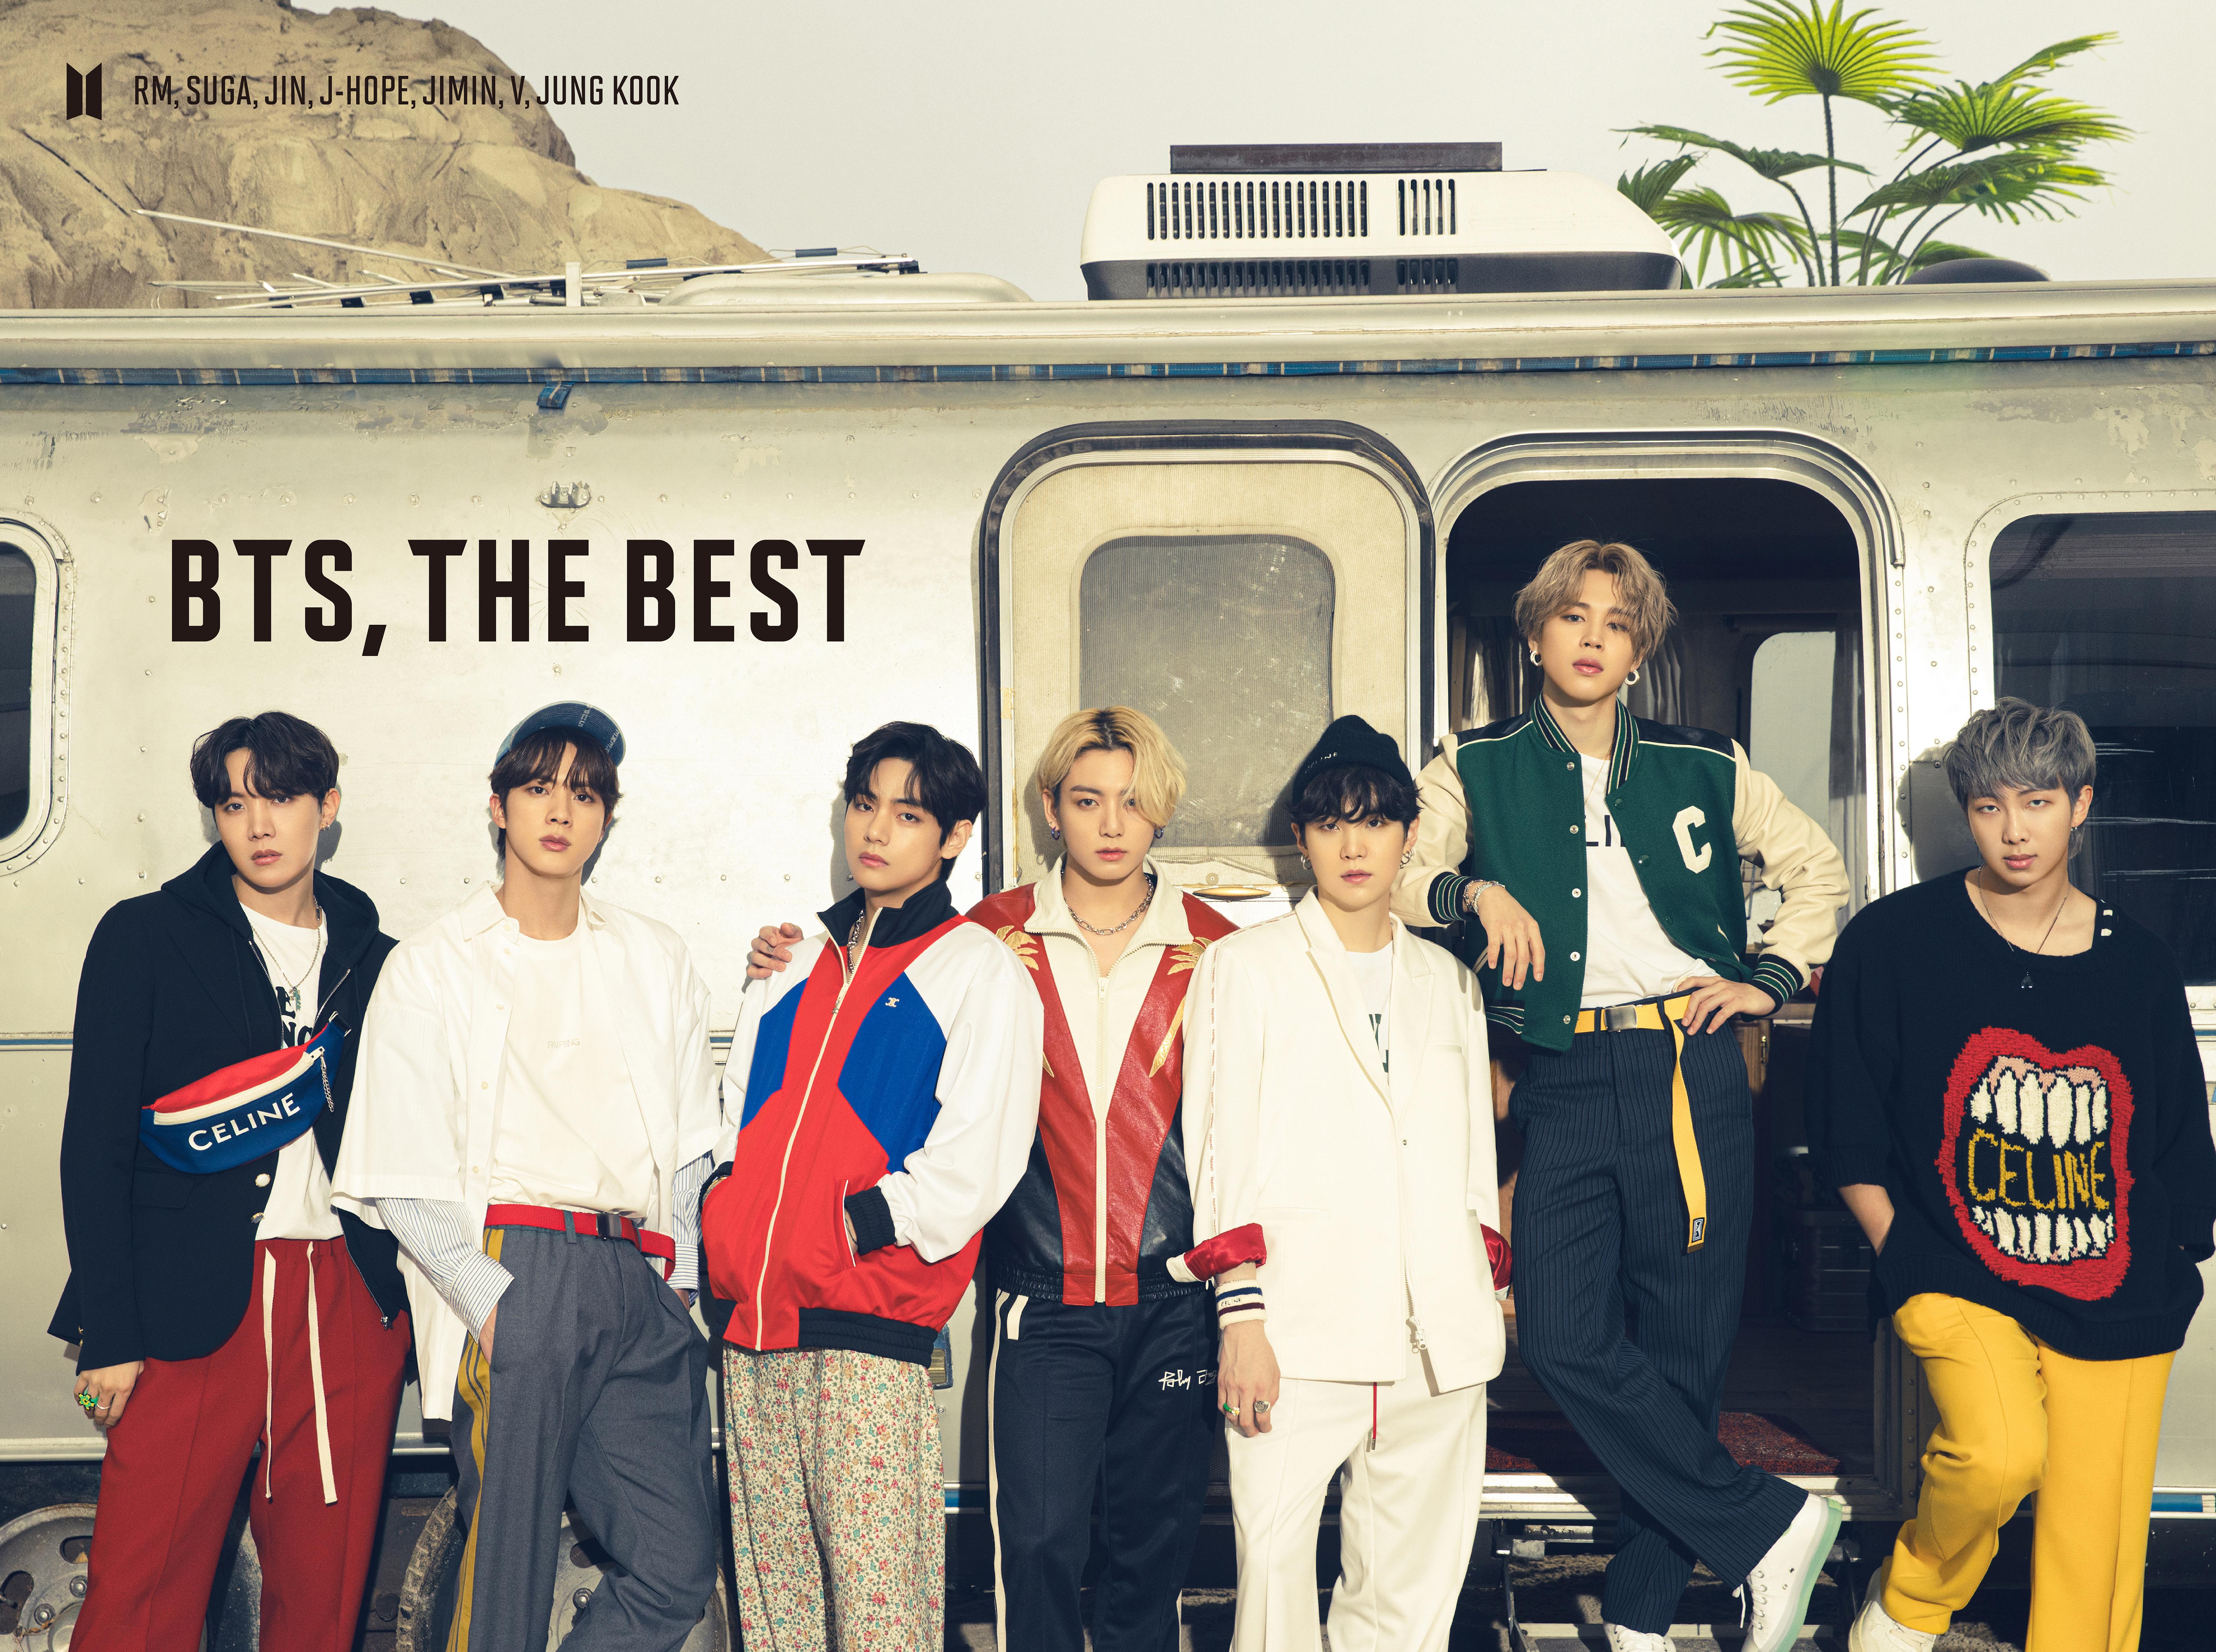 BTS, THE BEST<初回限定盤B>